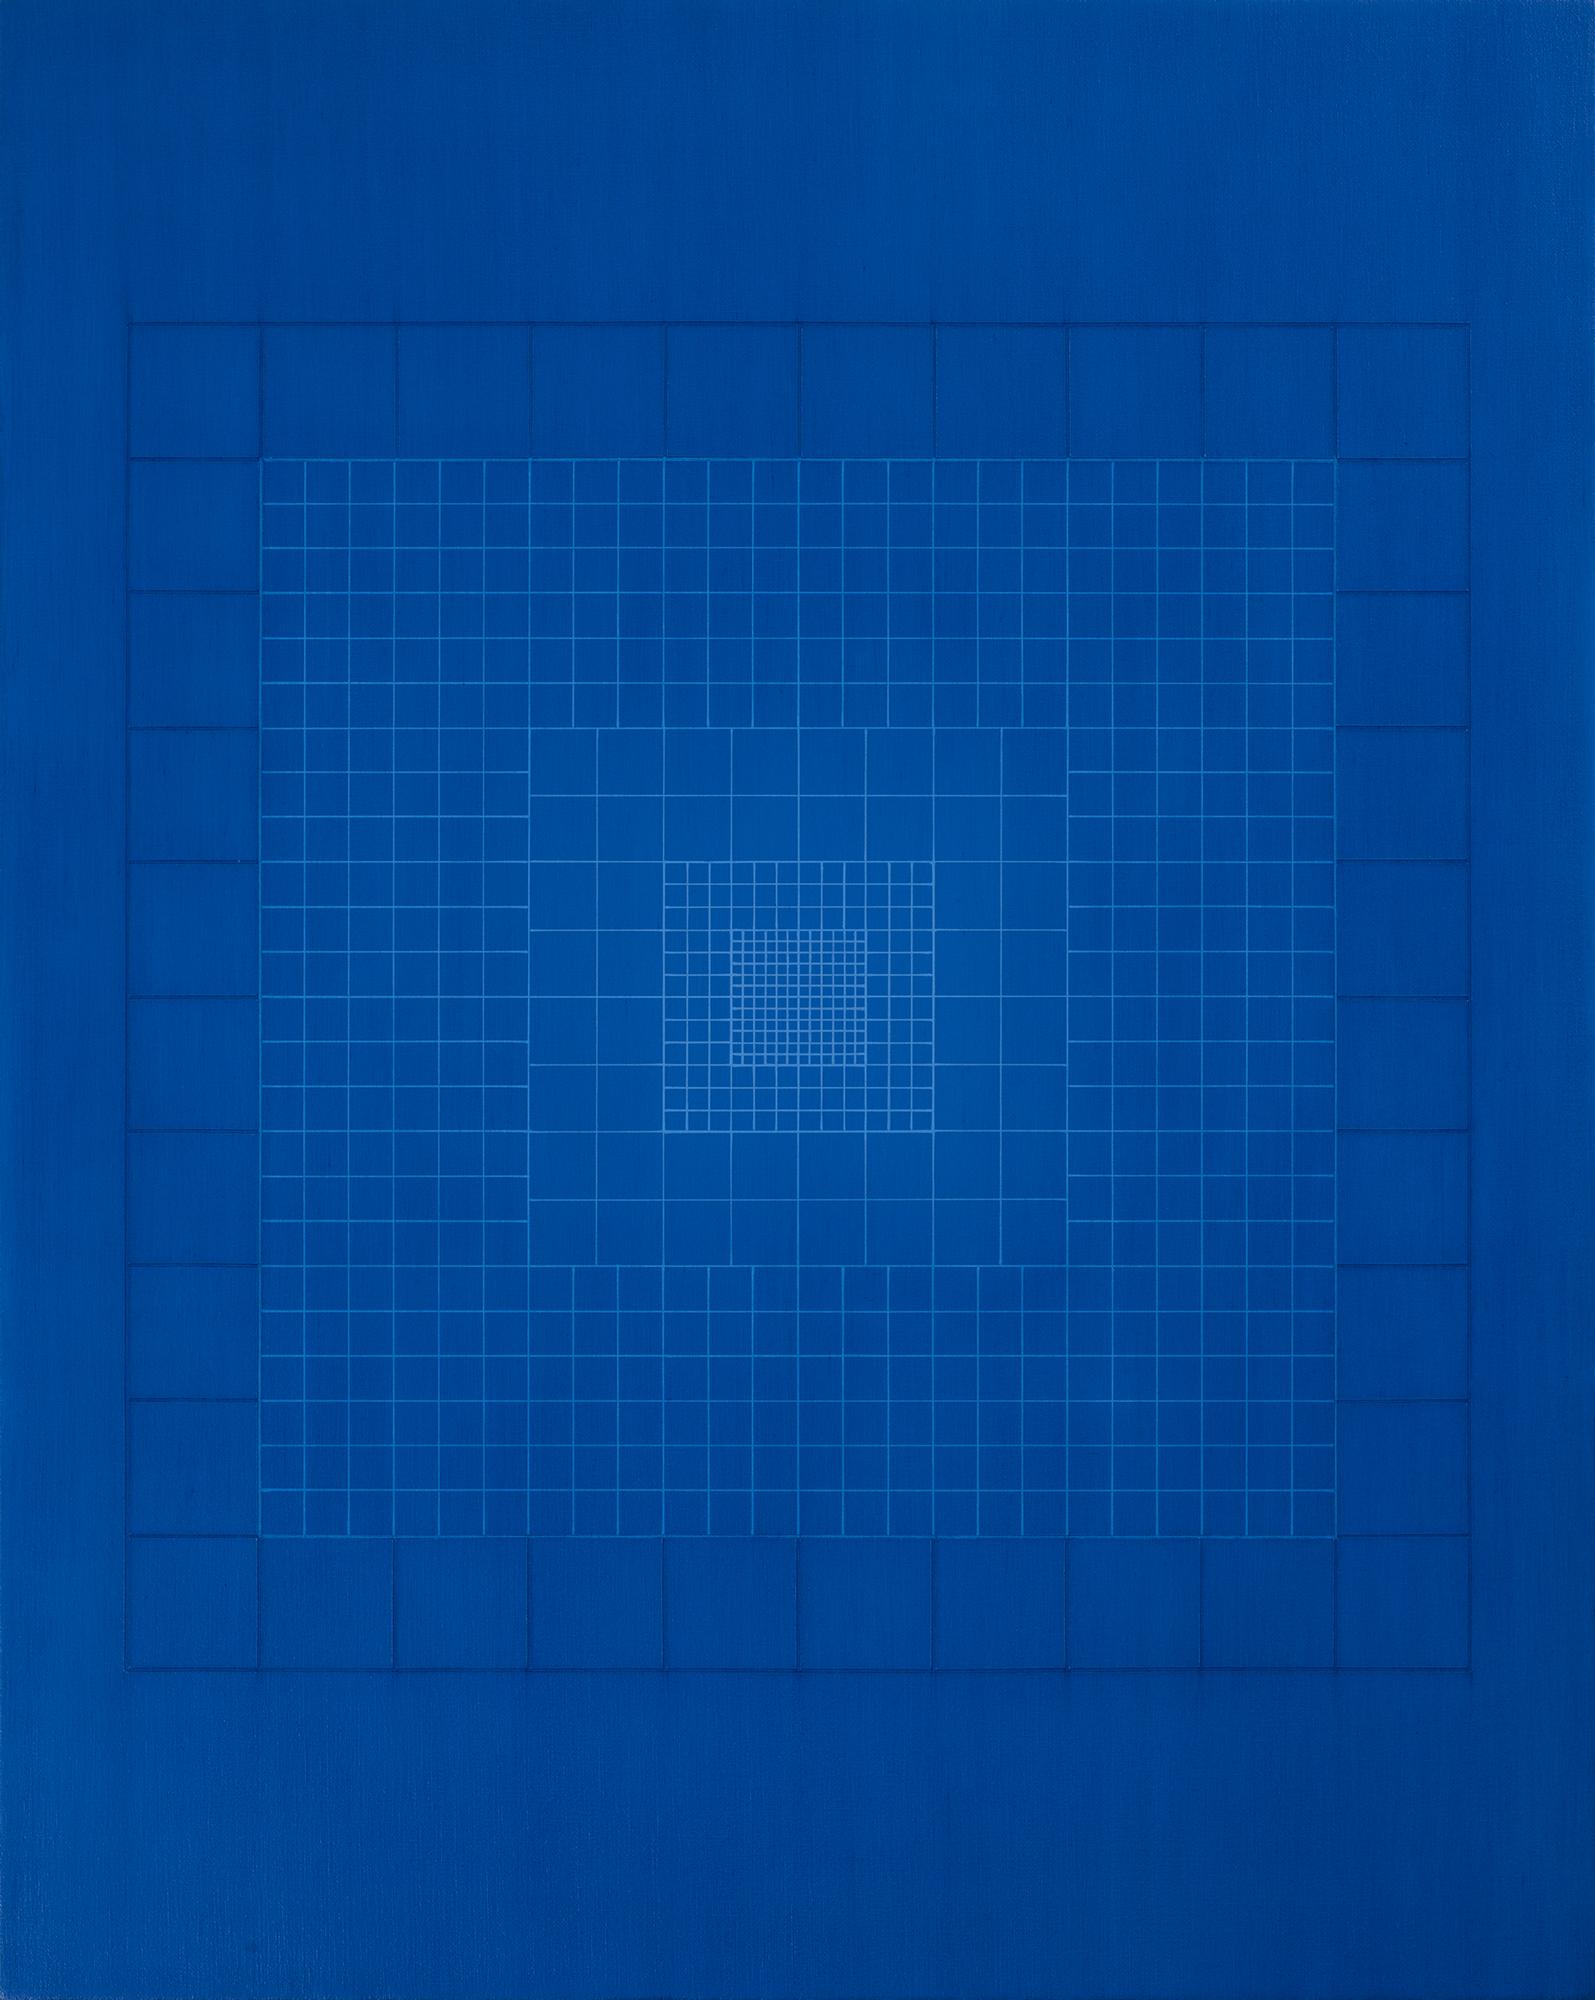 Silent-origo-metrum[20181012], 2018, acrylic on canvas, 29 1/2 x 23 5/8in.[75x60cm]